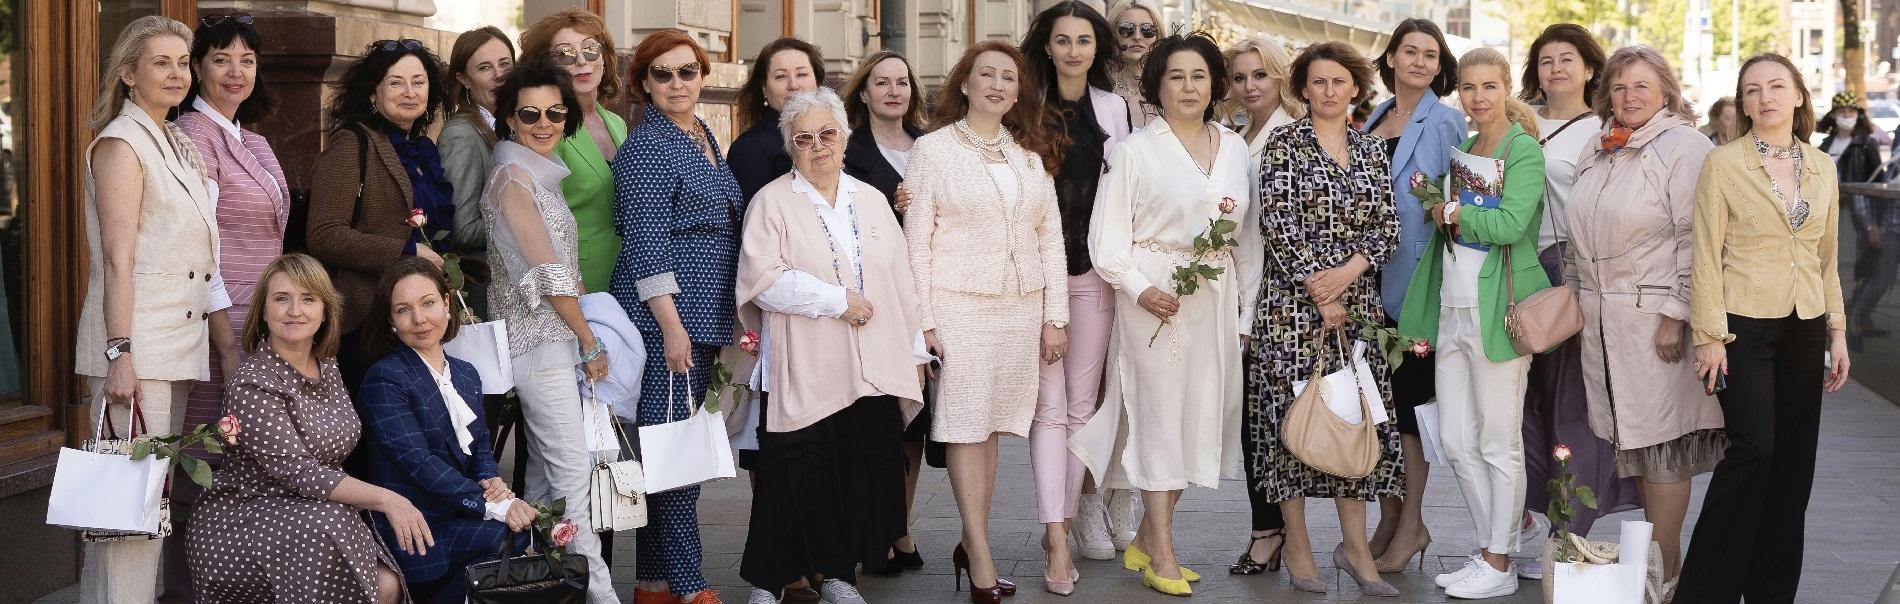 International Women's Union